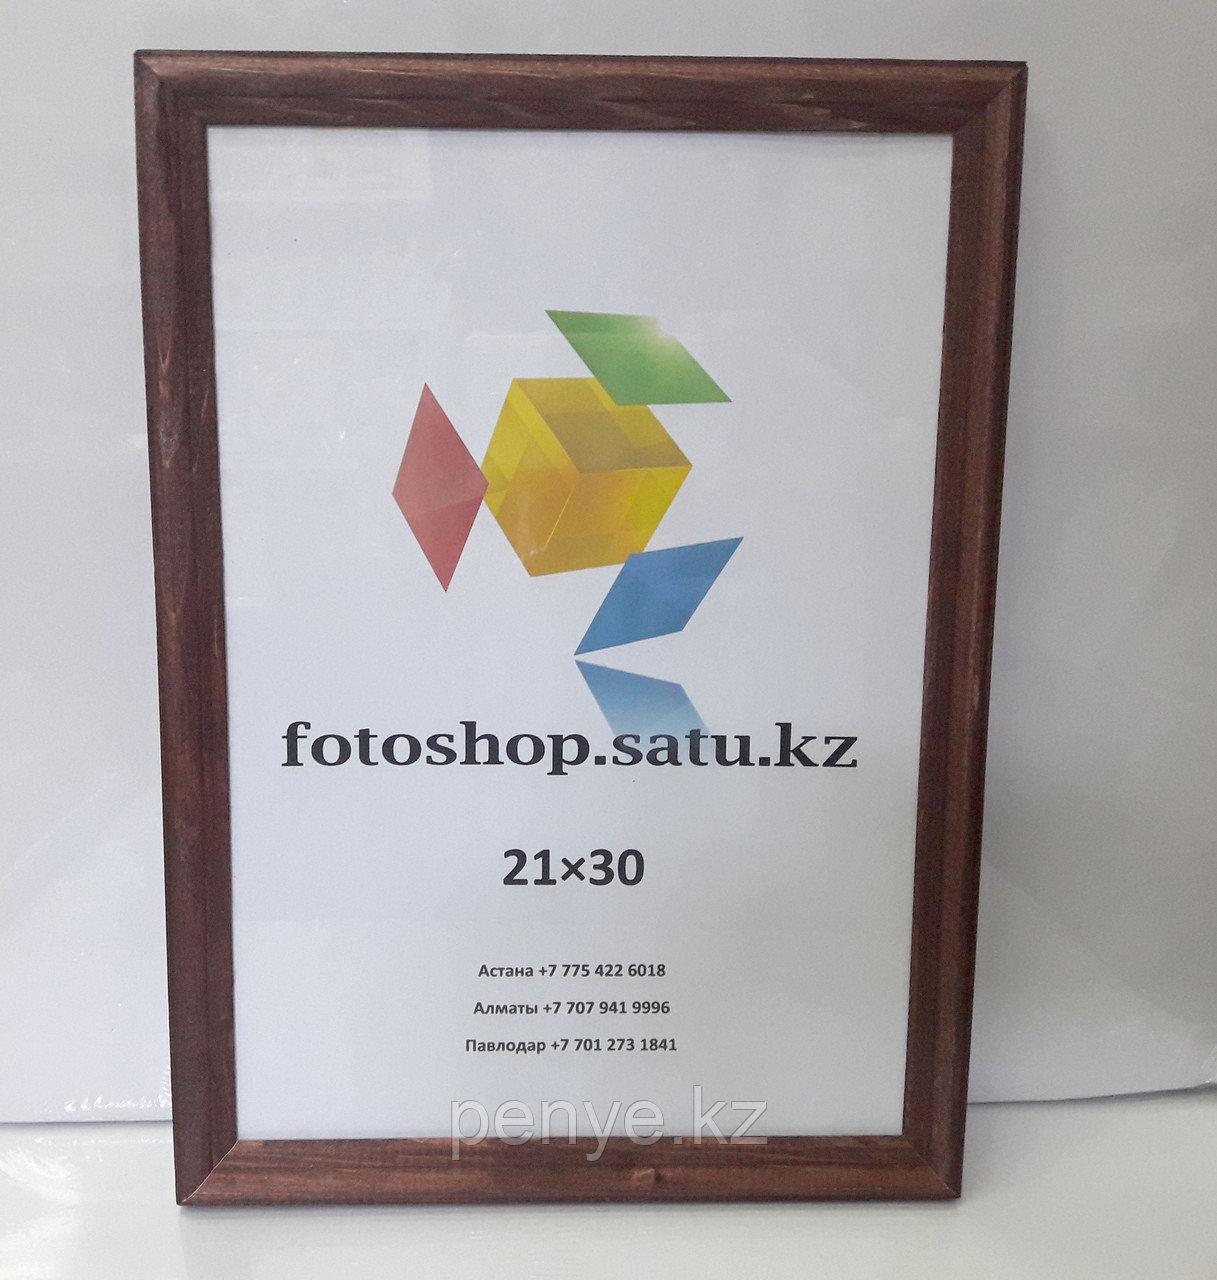 Фоторамка 21x30 - фото 1